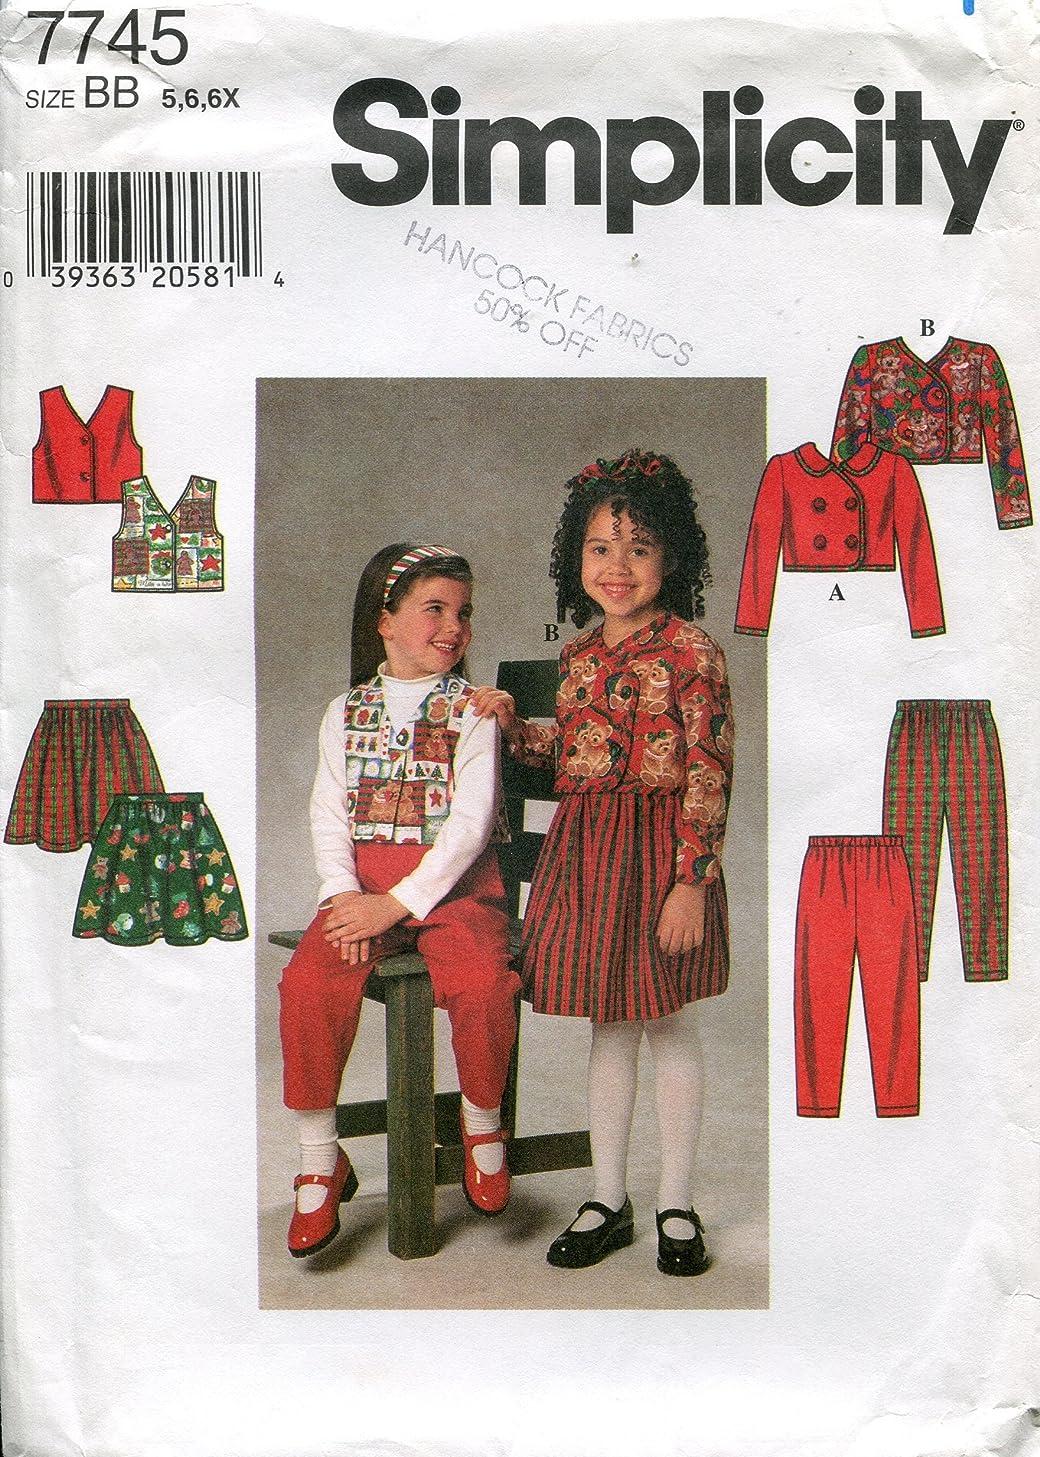 Simplicity Pattern 7745 Girl's Jacket, Vest, Skirt and Pants, Size BB (5-6-6X)